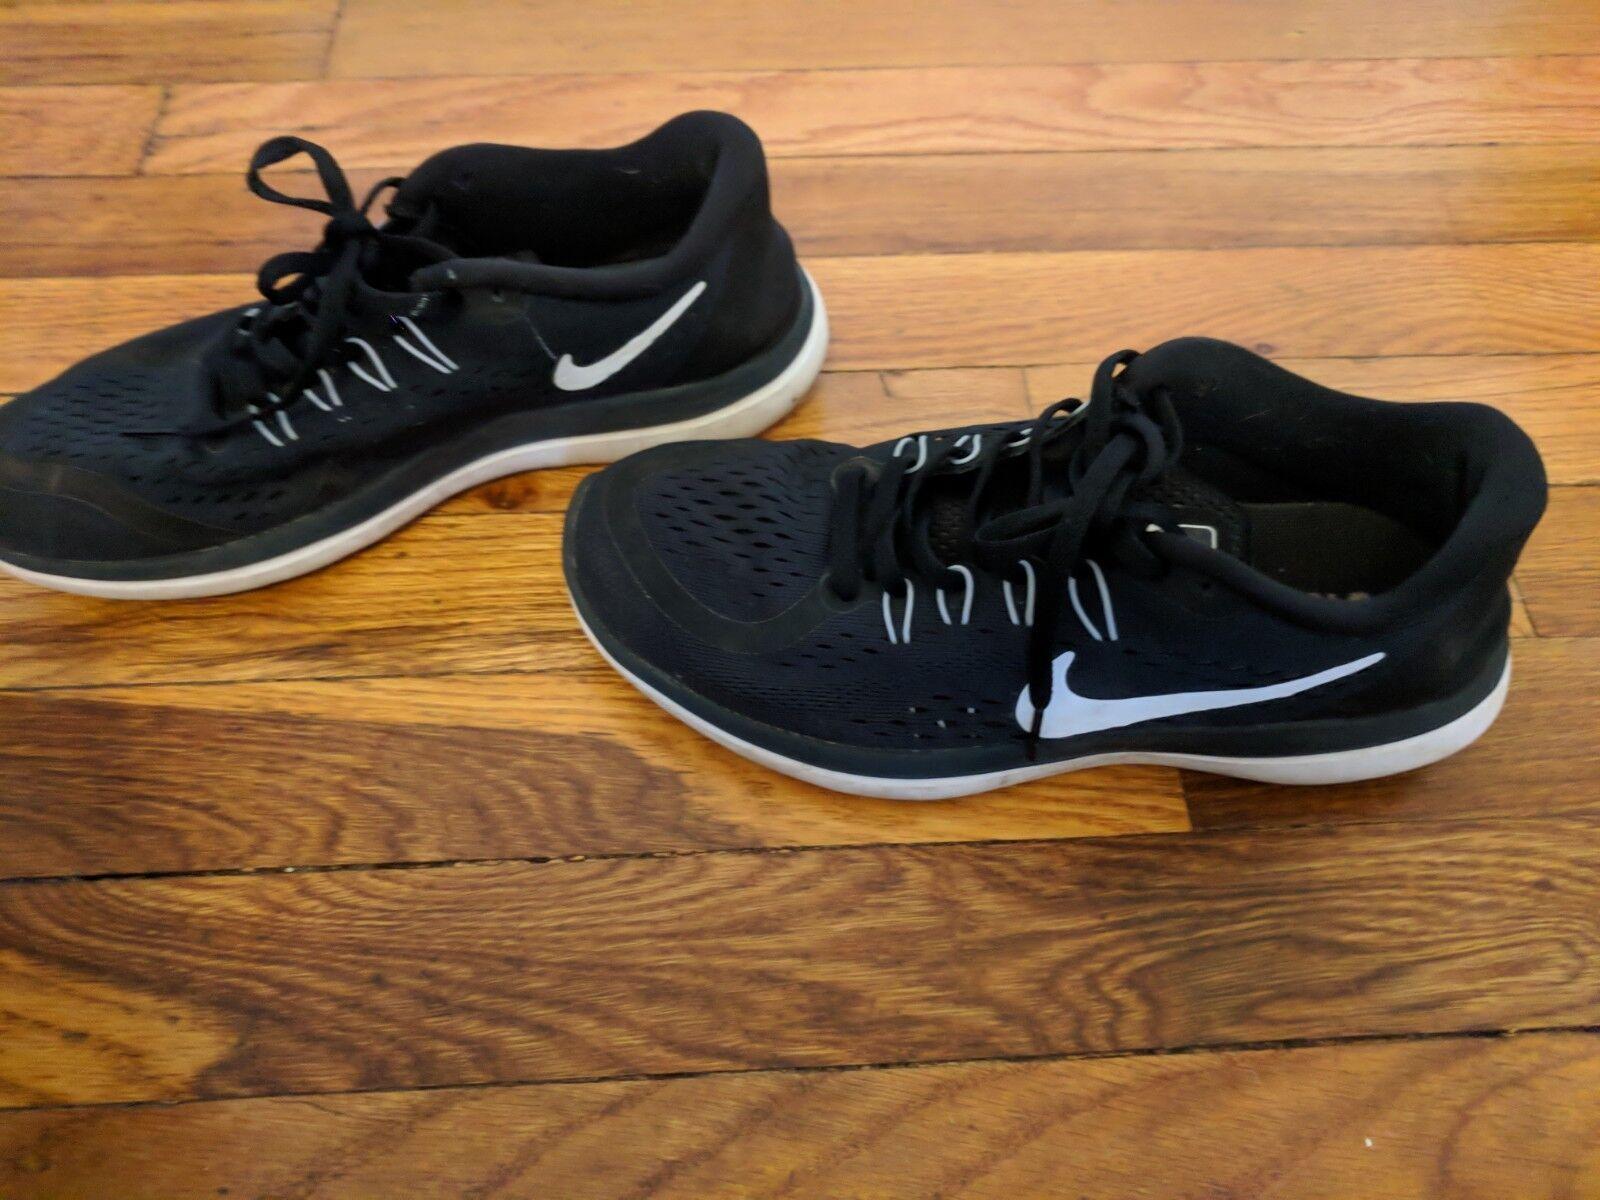 Nike Flex fit Flex Nike tennis shoes size 8 cd6713